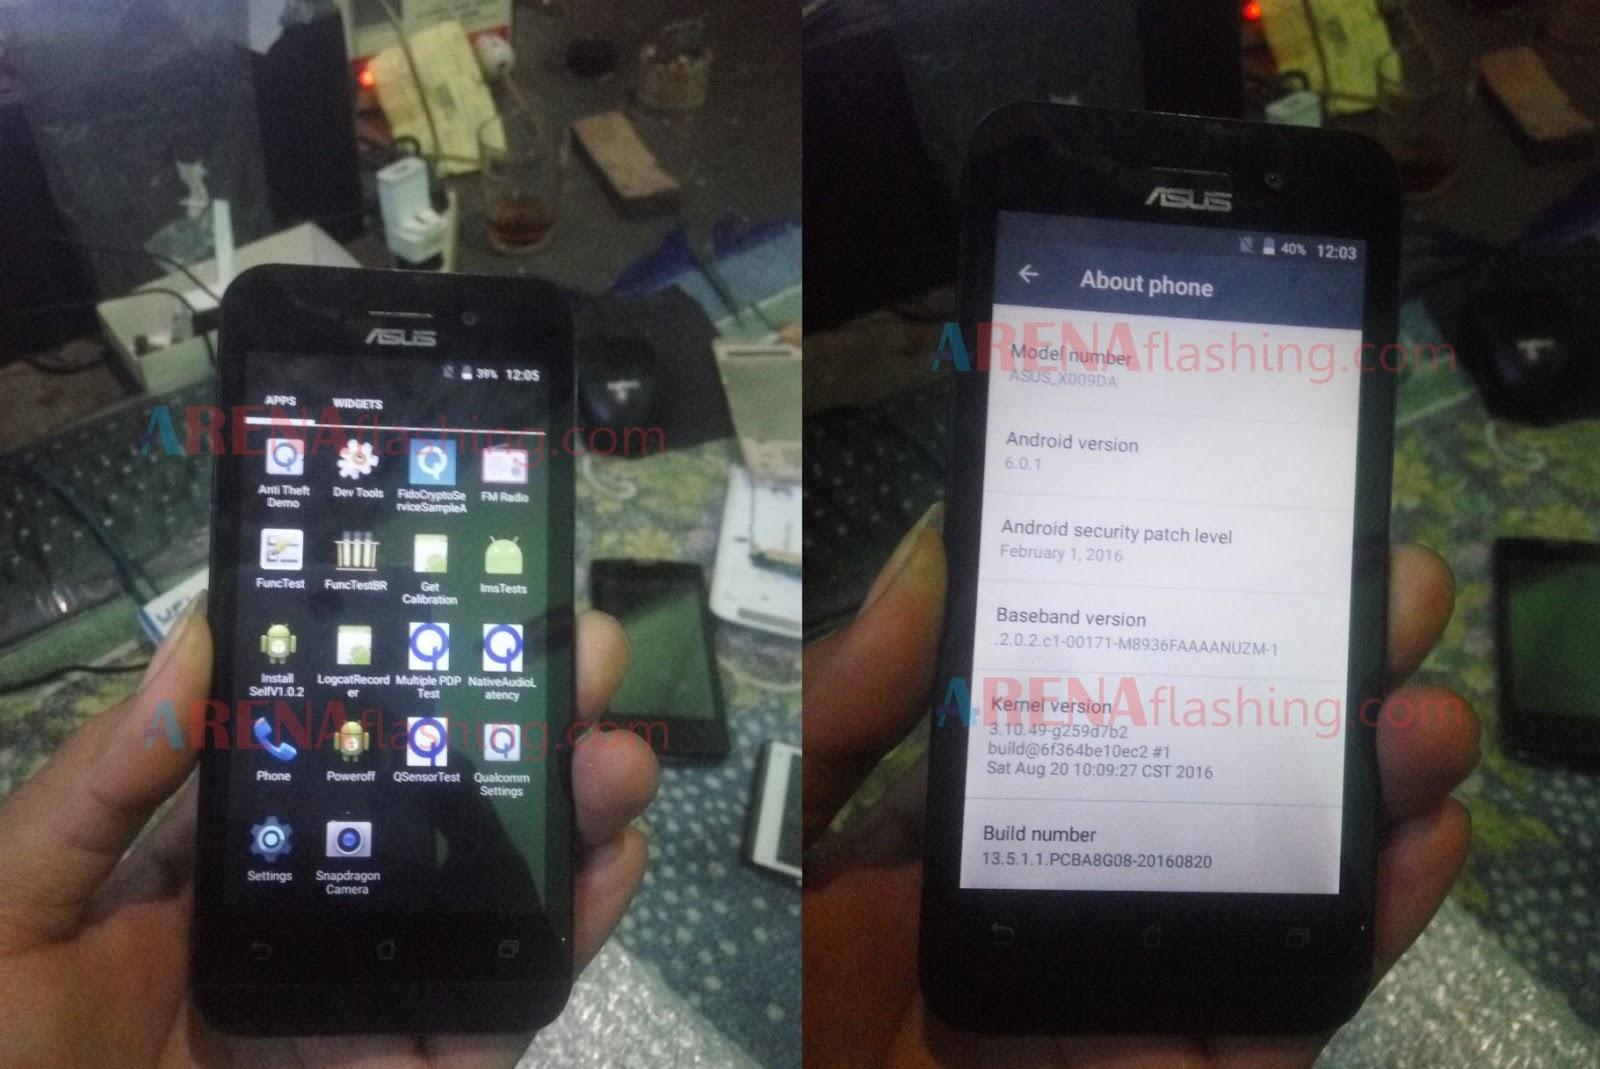 Cara Flash Asus Zenfone Go 4g X009da Zb450kl Via Pc